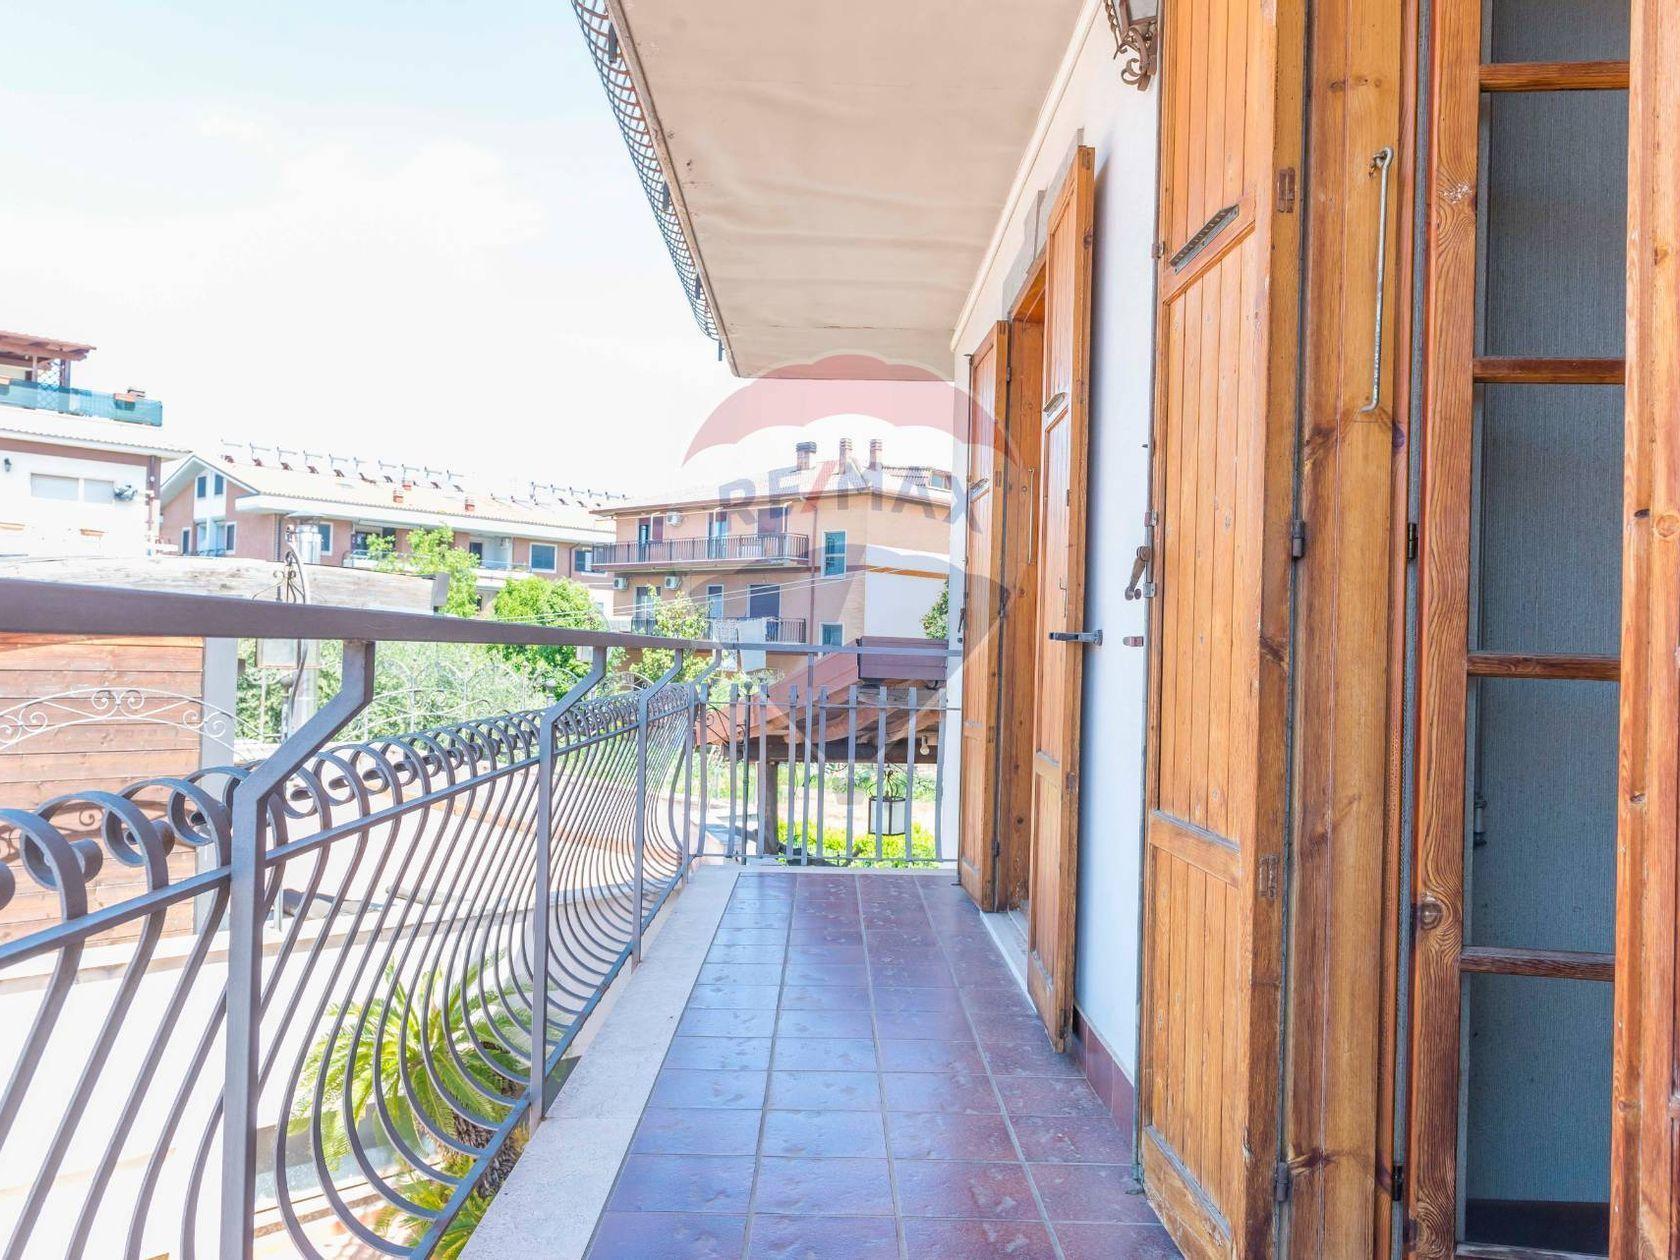 Villa singola Roma - Castelverde - Villaggio Prenestino, Roma, RM Vendita - Foto 33